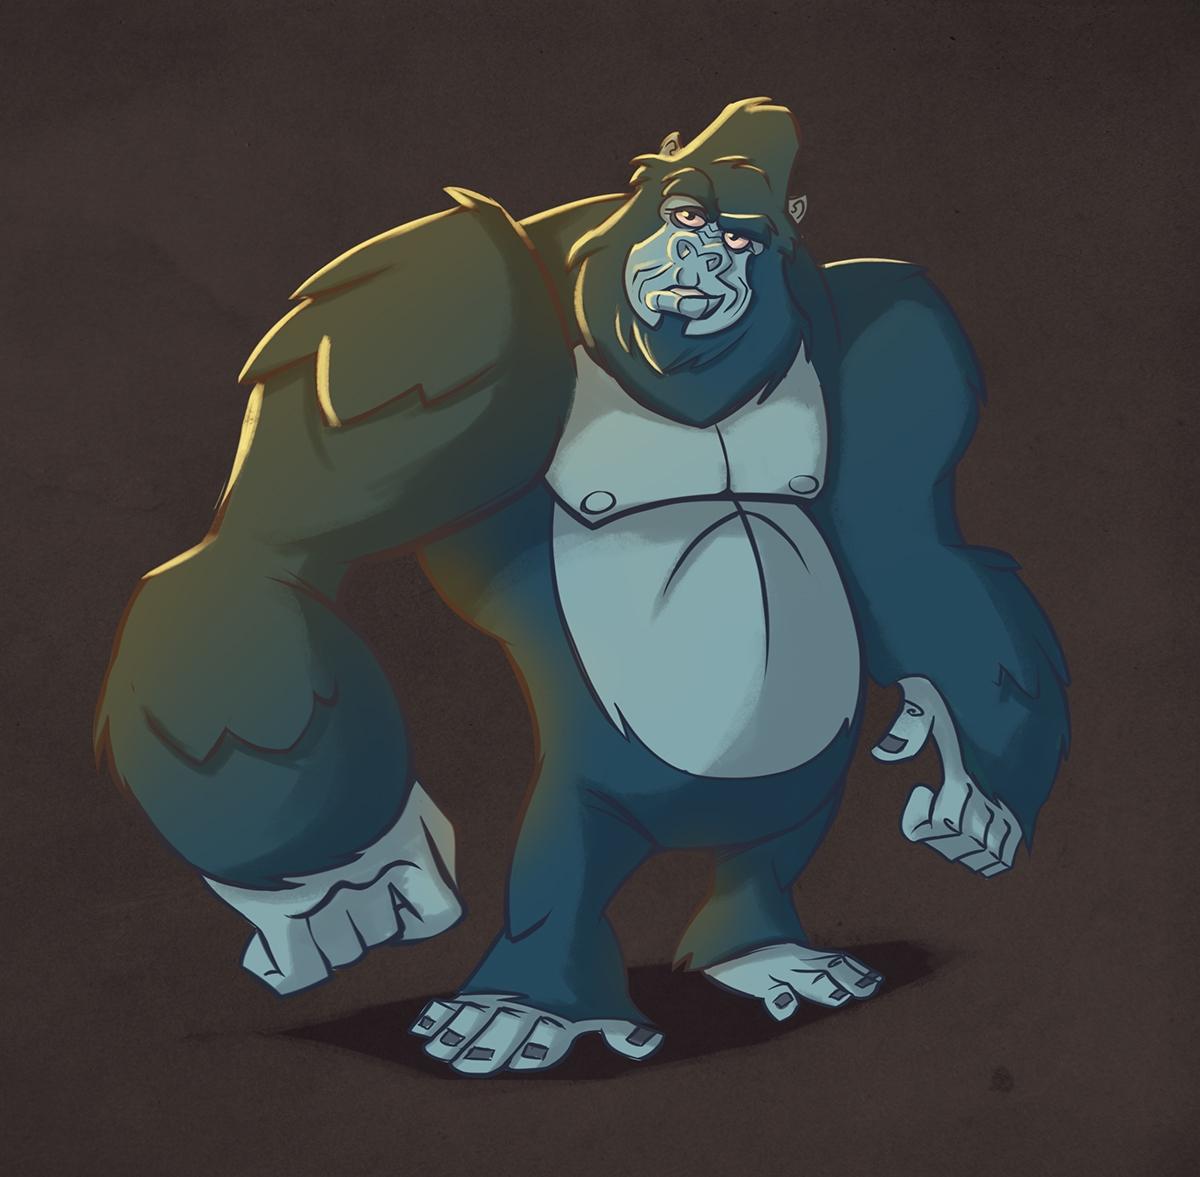 gorrilla - animal, animation, monkey - michelverdu | ello